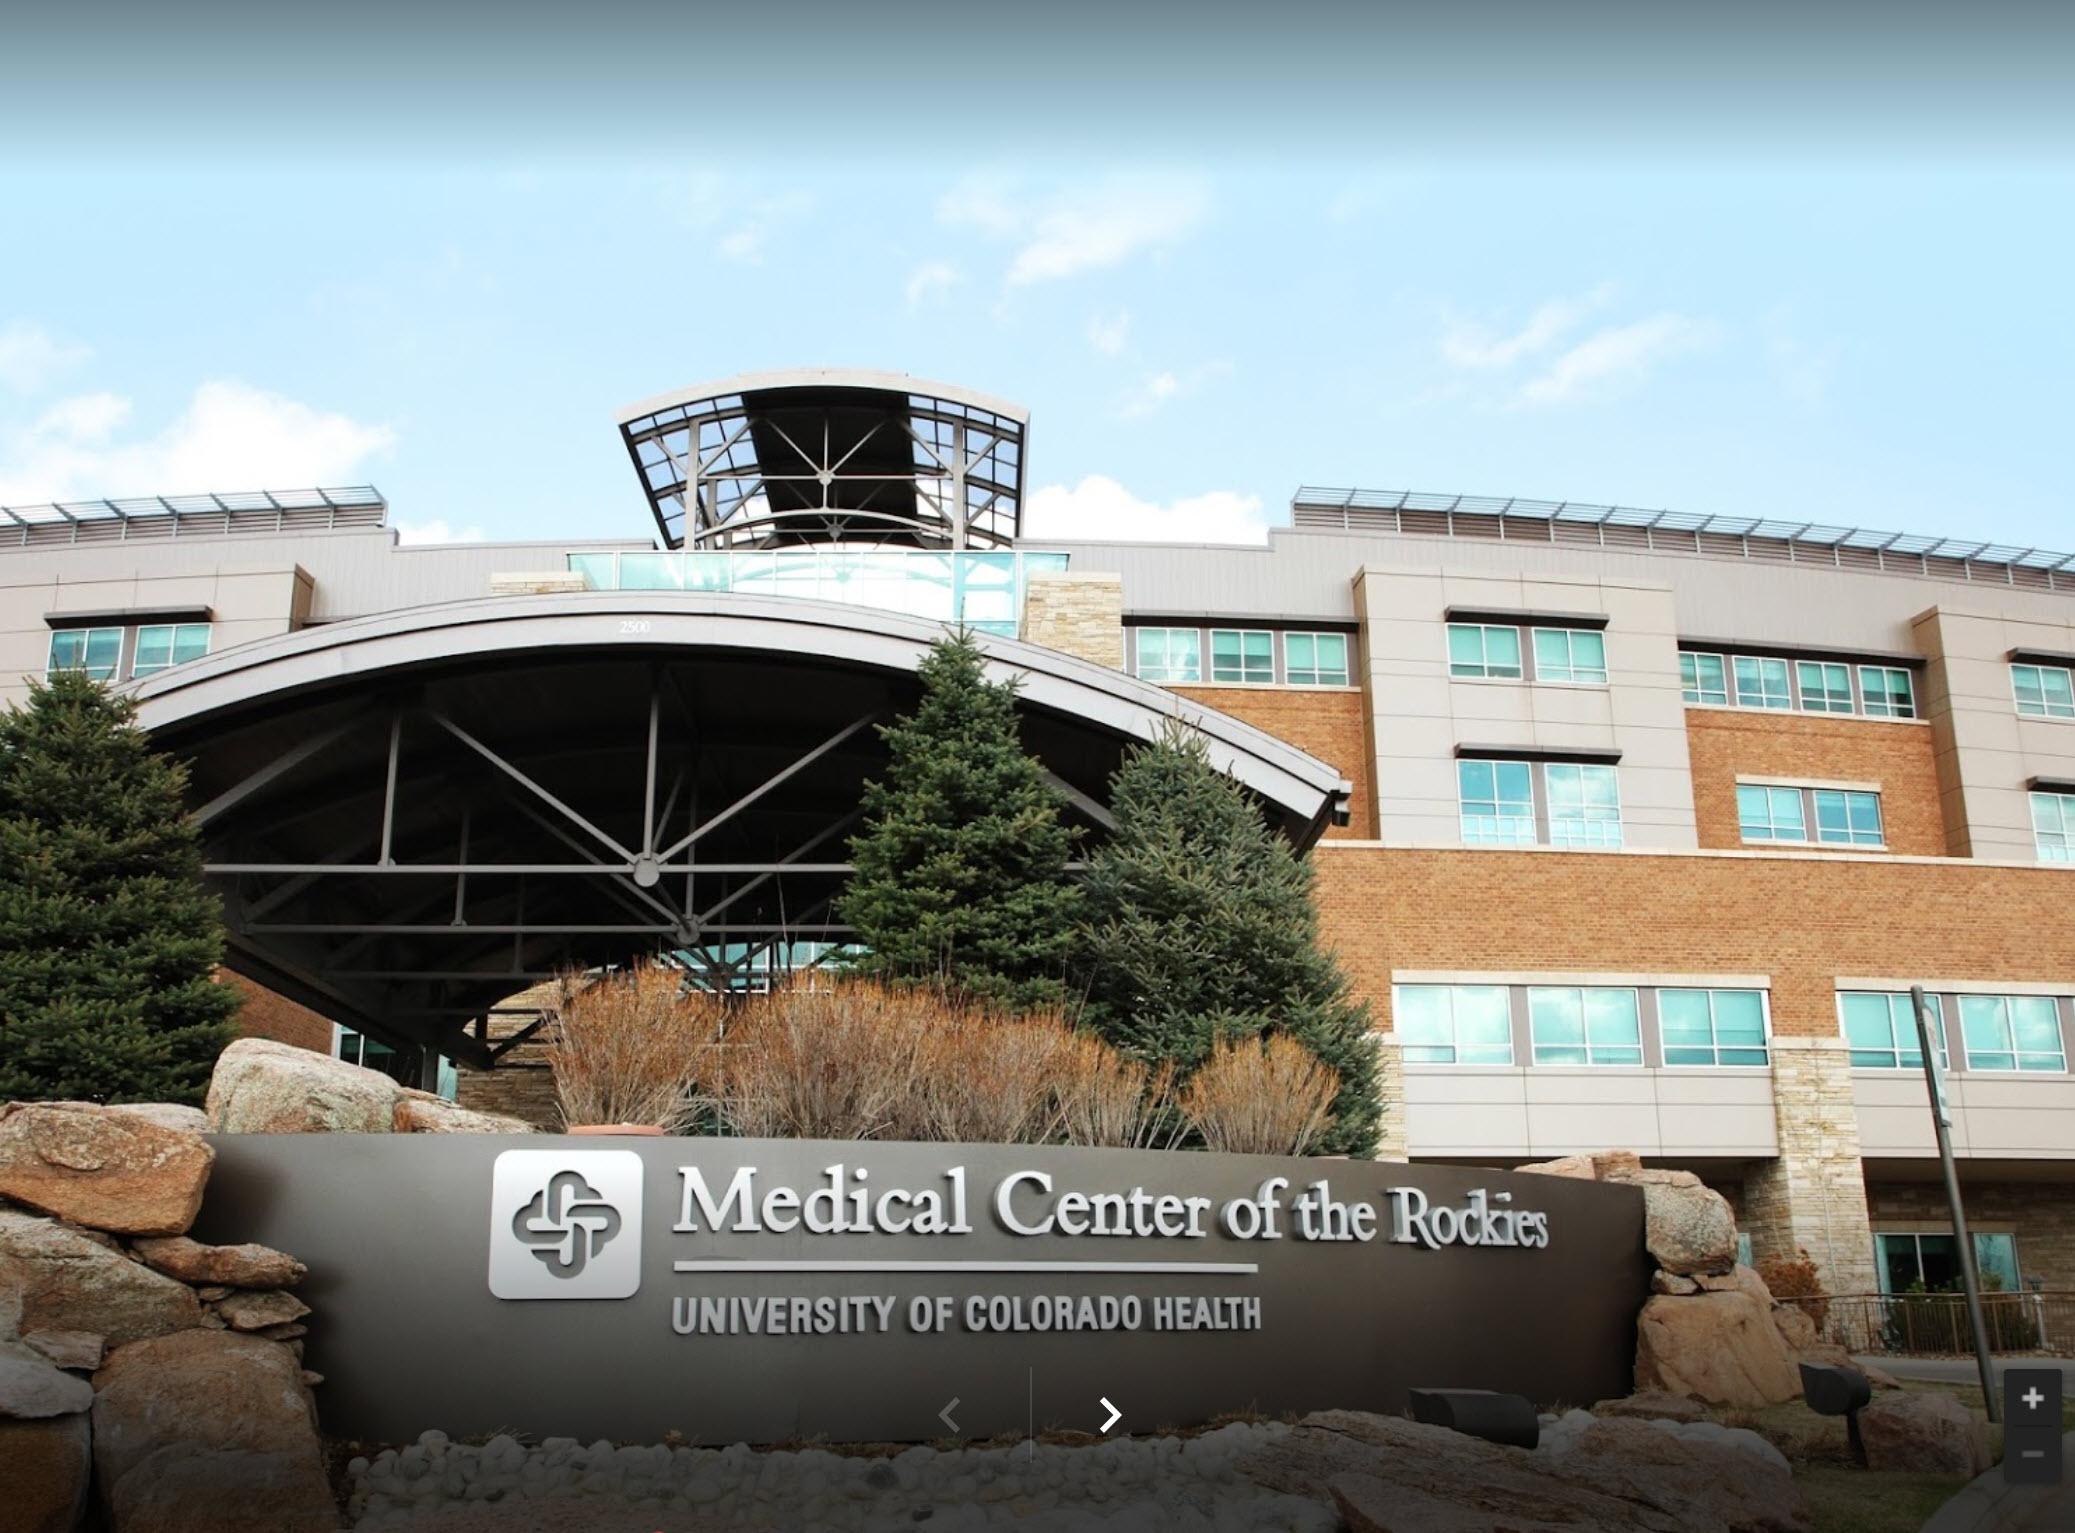 HospitaloftheRockers_Scimedico_LLC